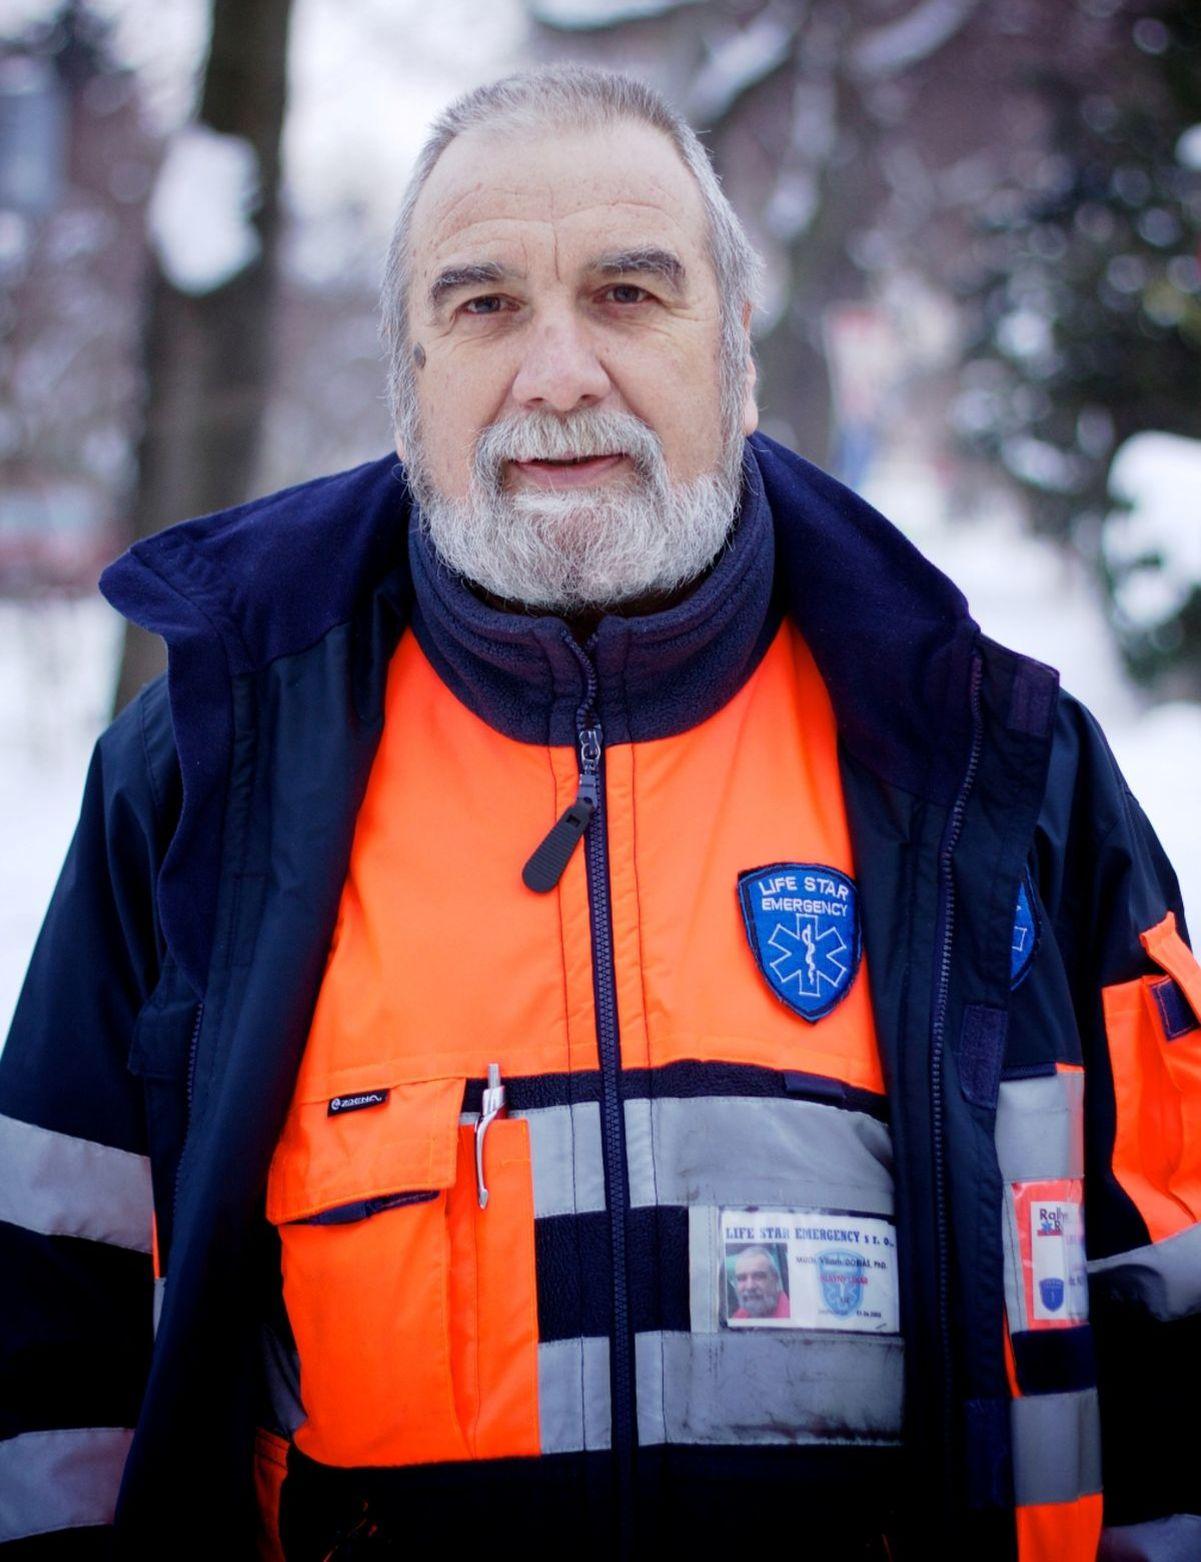 Špecialista na urgentnú medicínu doc. MUDr. Viliam Dobiáš, PhD.